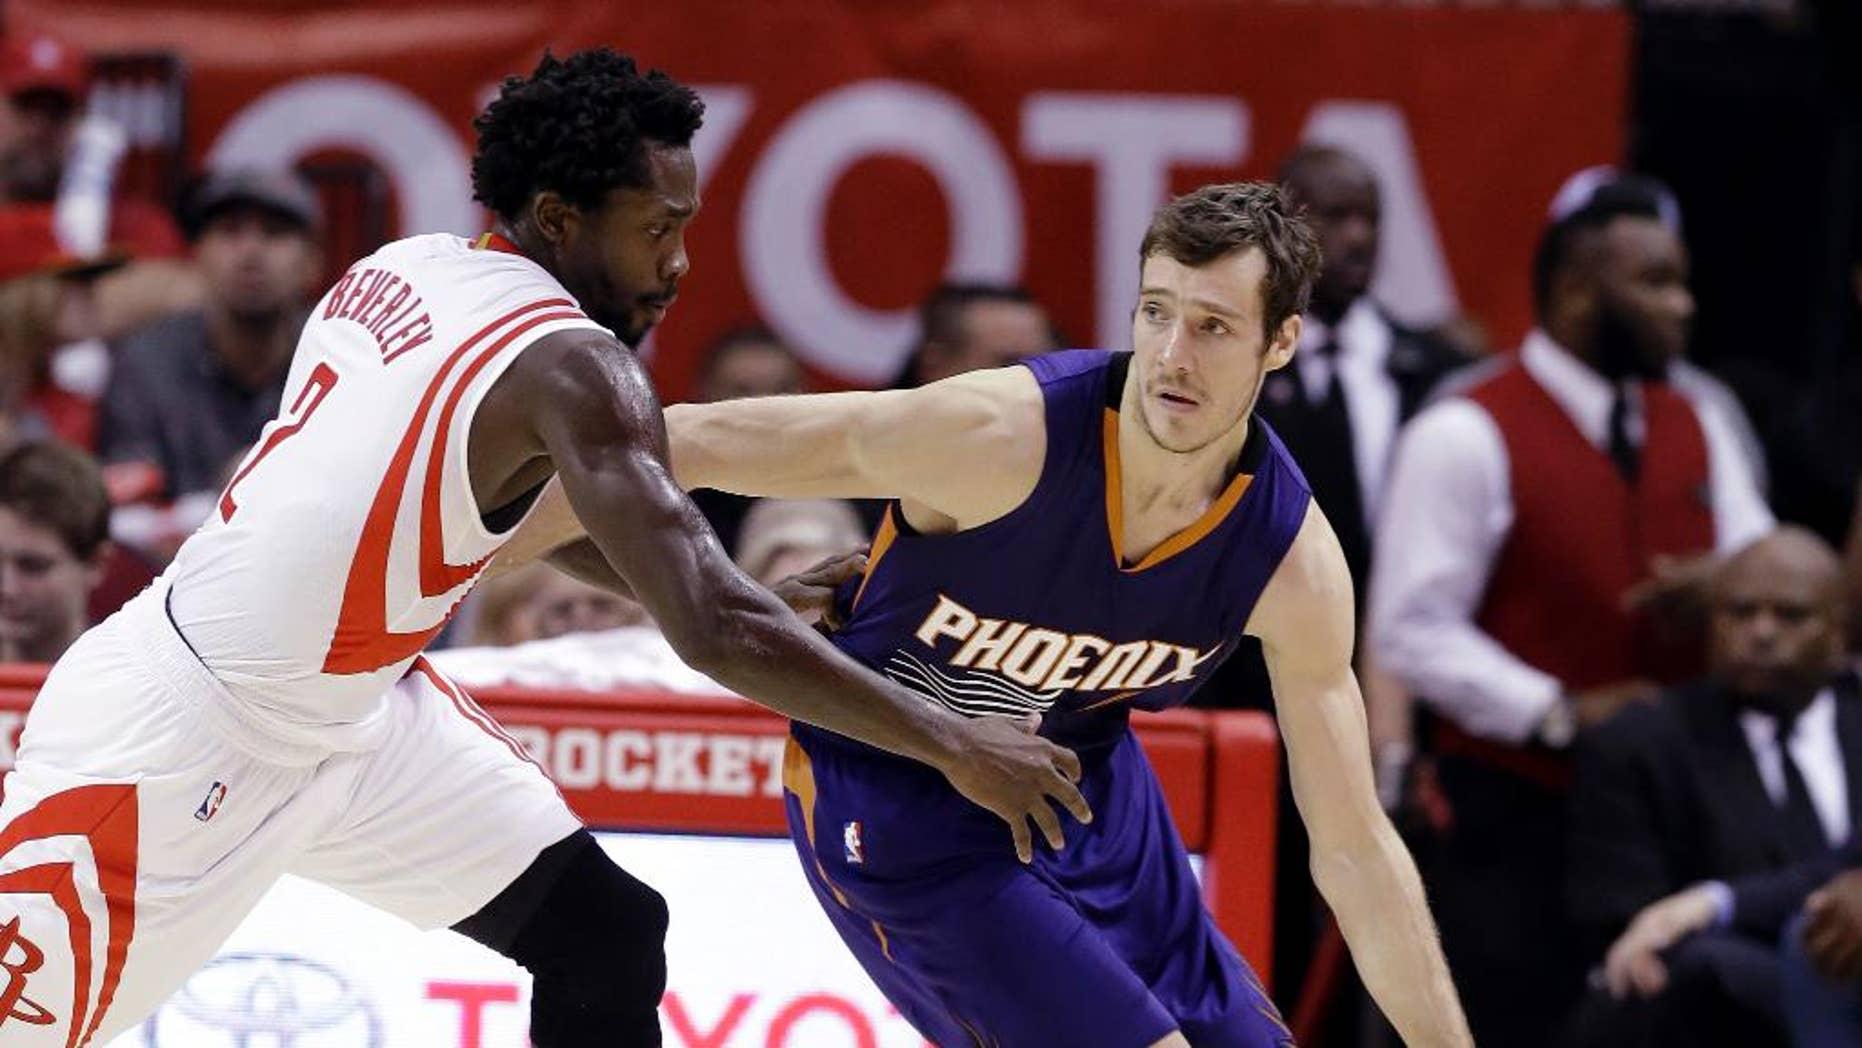 Phoenix Suns' Goran Dragic (1) is pressured by Houston Rockets' Patrick Beverley (2) in the second half of an NBA basketball game Saturday, Dec. 6, 2014, in Houston. The Rockets won 100-95. (AP Photo/Pat Sullivan)